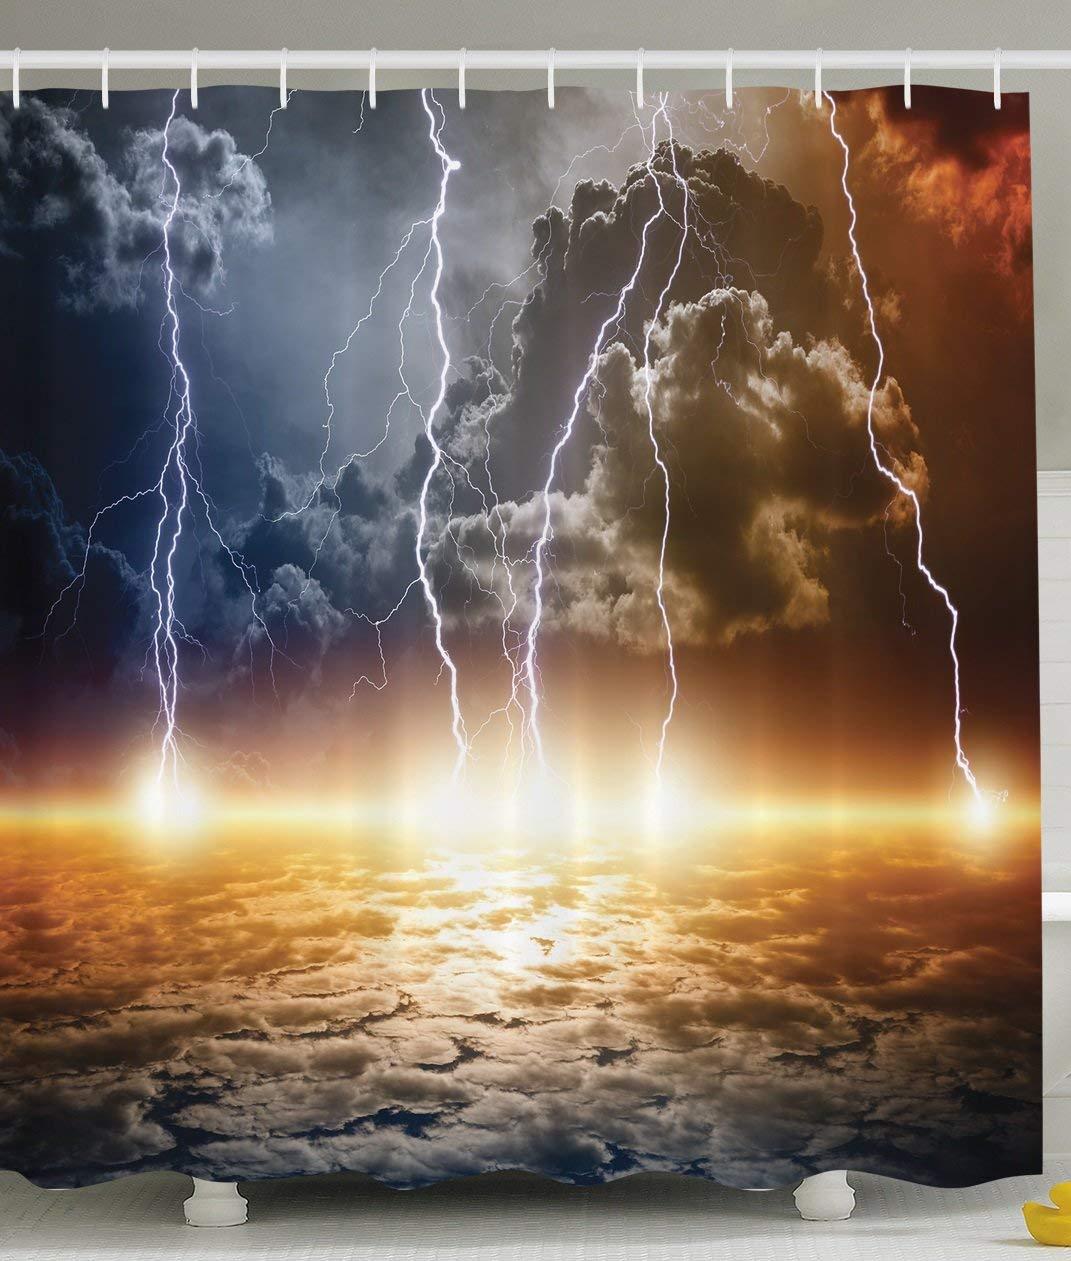 US $14.17 38% OFF|Shower Curtain Bathroom with Lightning Storm Rainy on water bathroom design, black and white bathroom design, beach bathroom design, faith bathroom design, under the sea bathroom design, home bathroom design, arts and crafts bathroom design, classic bathroom design,